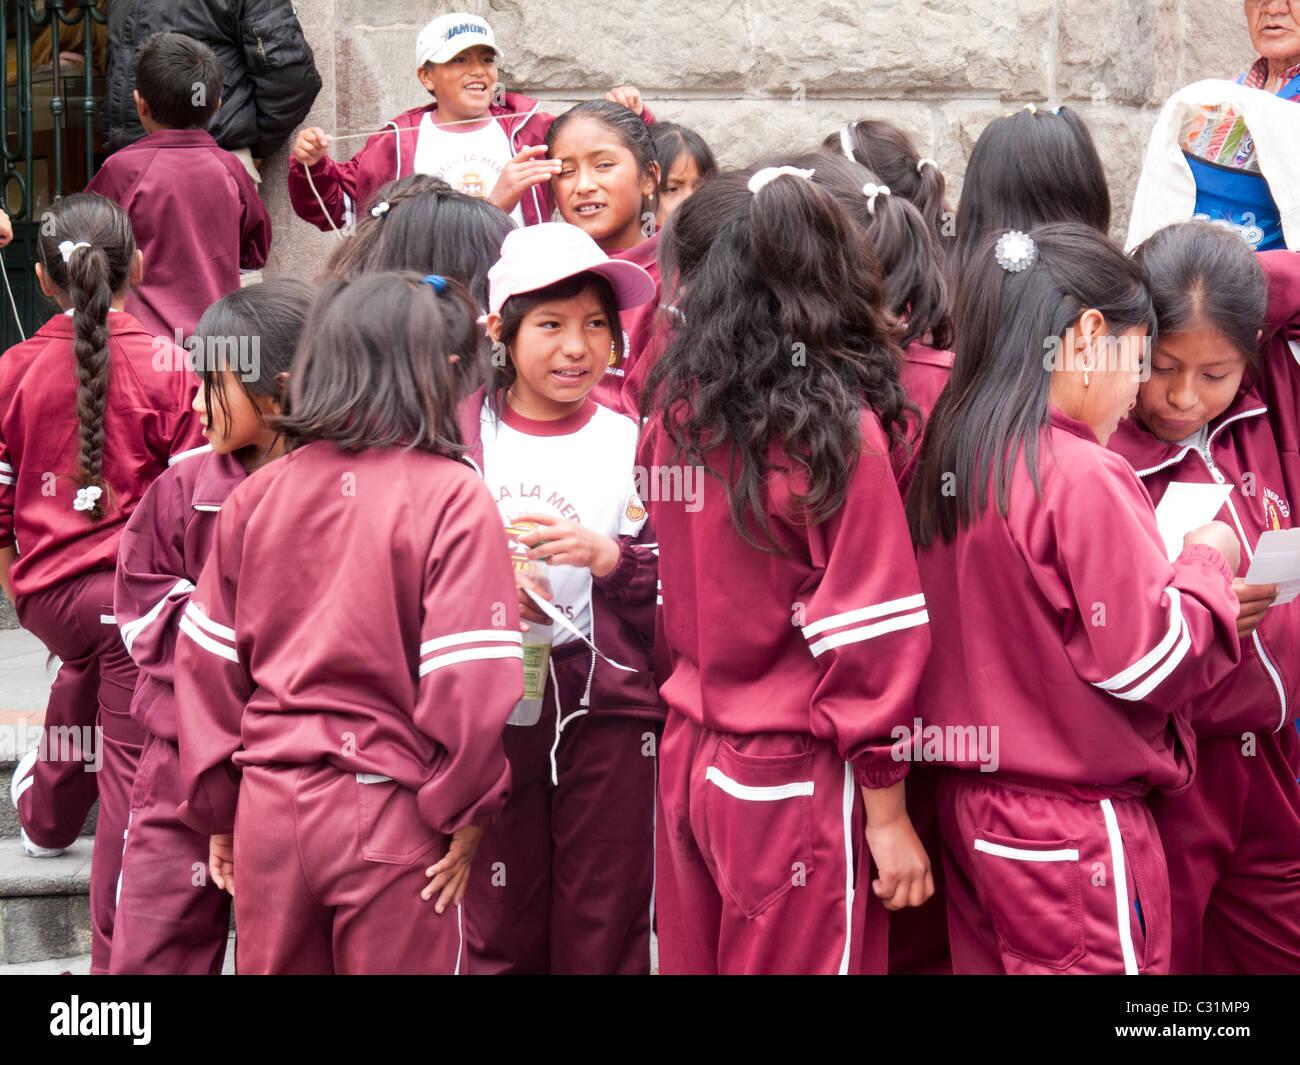 schoolchildren on field trip, Quito, Ecuador, South America - Stock Image